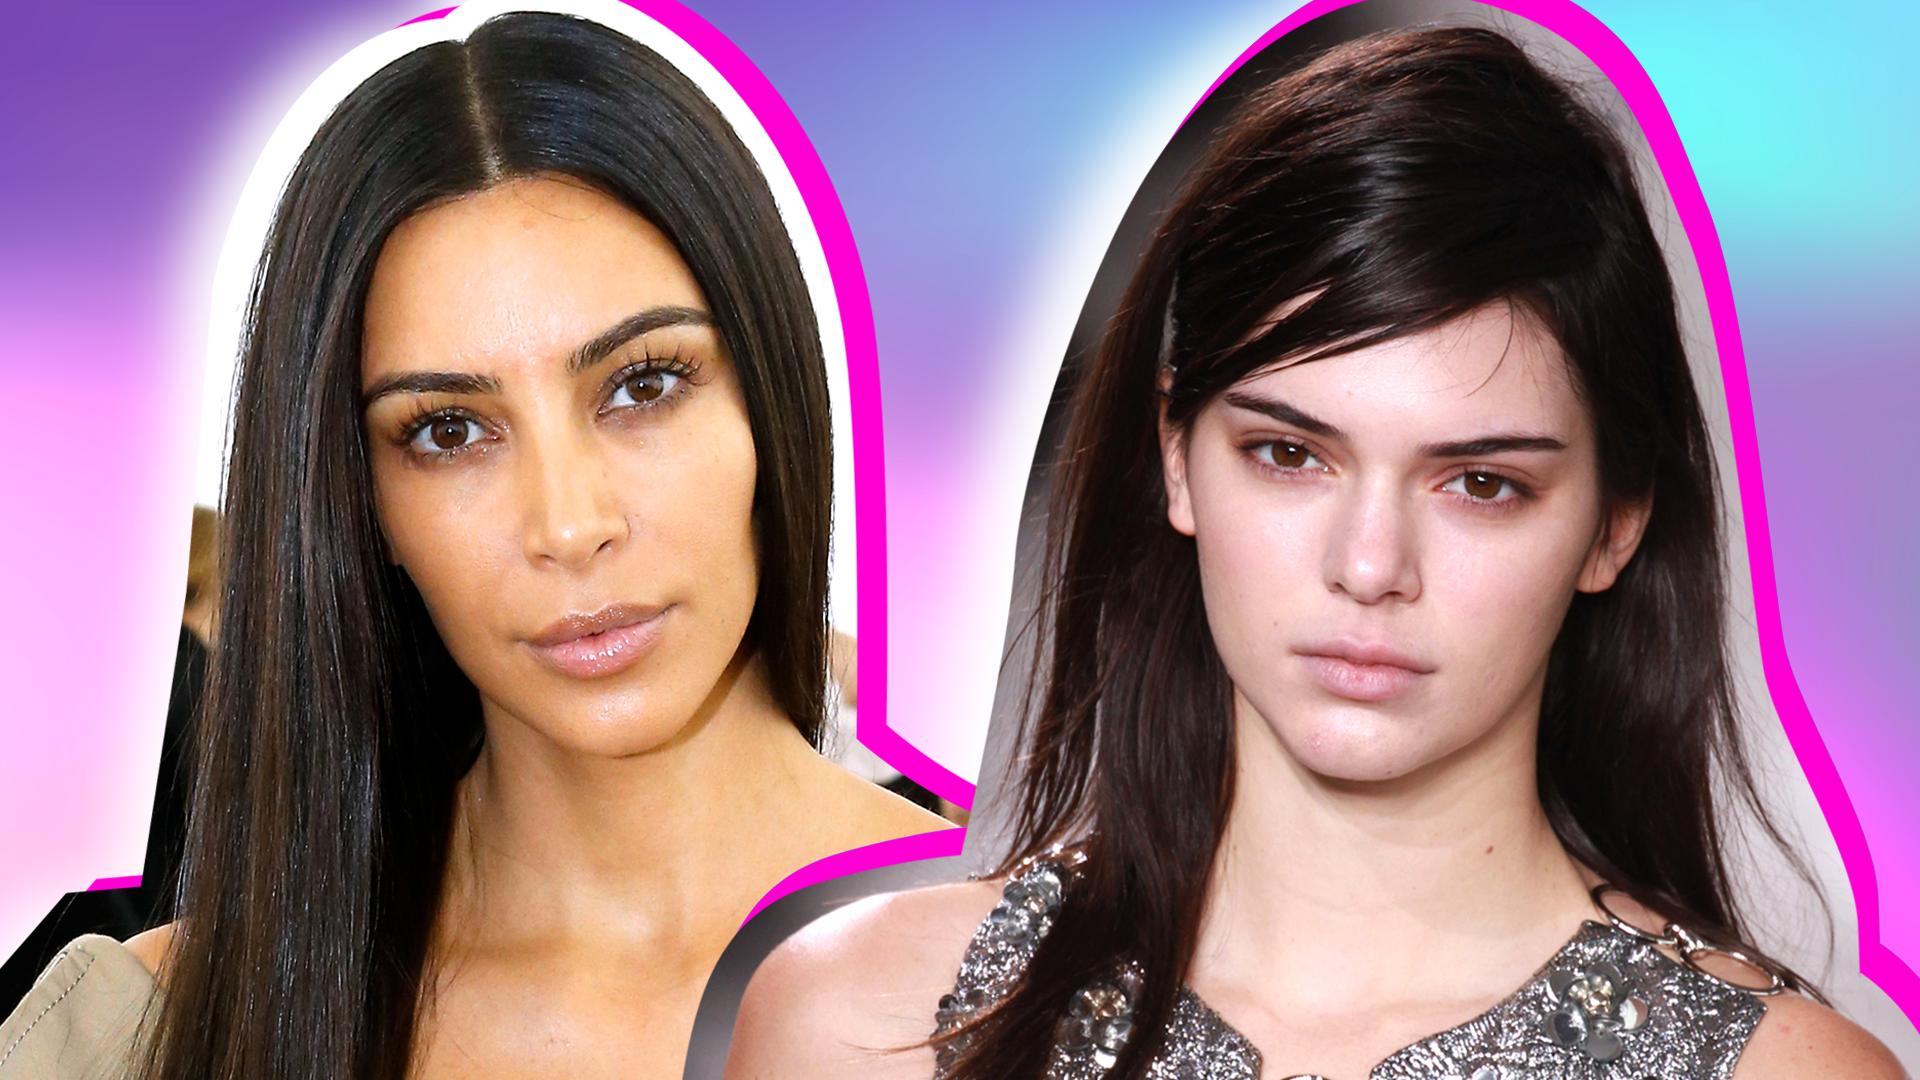 Kardashian Jenners Best Makeup Free